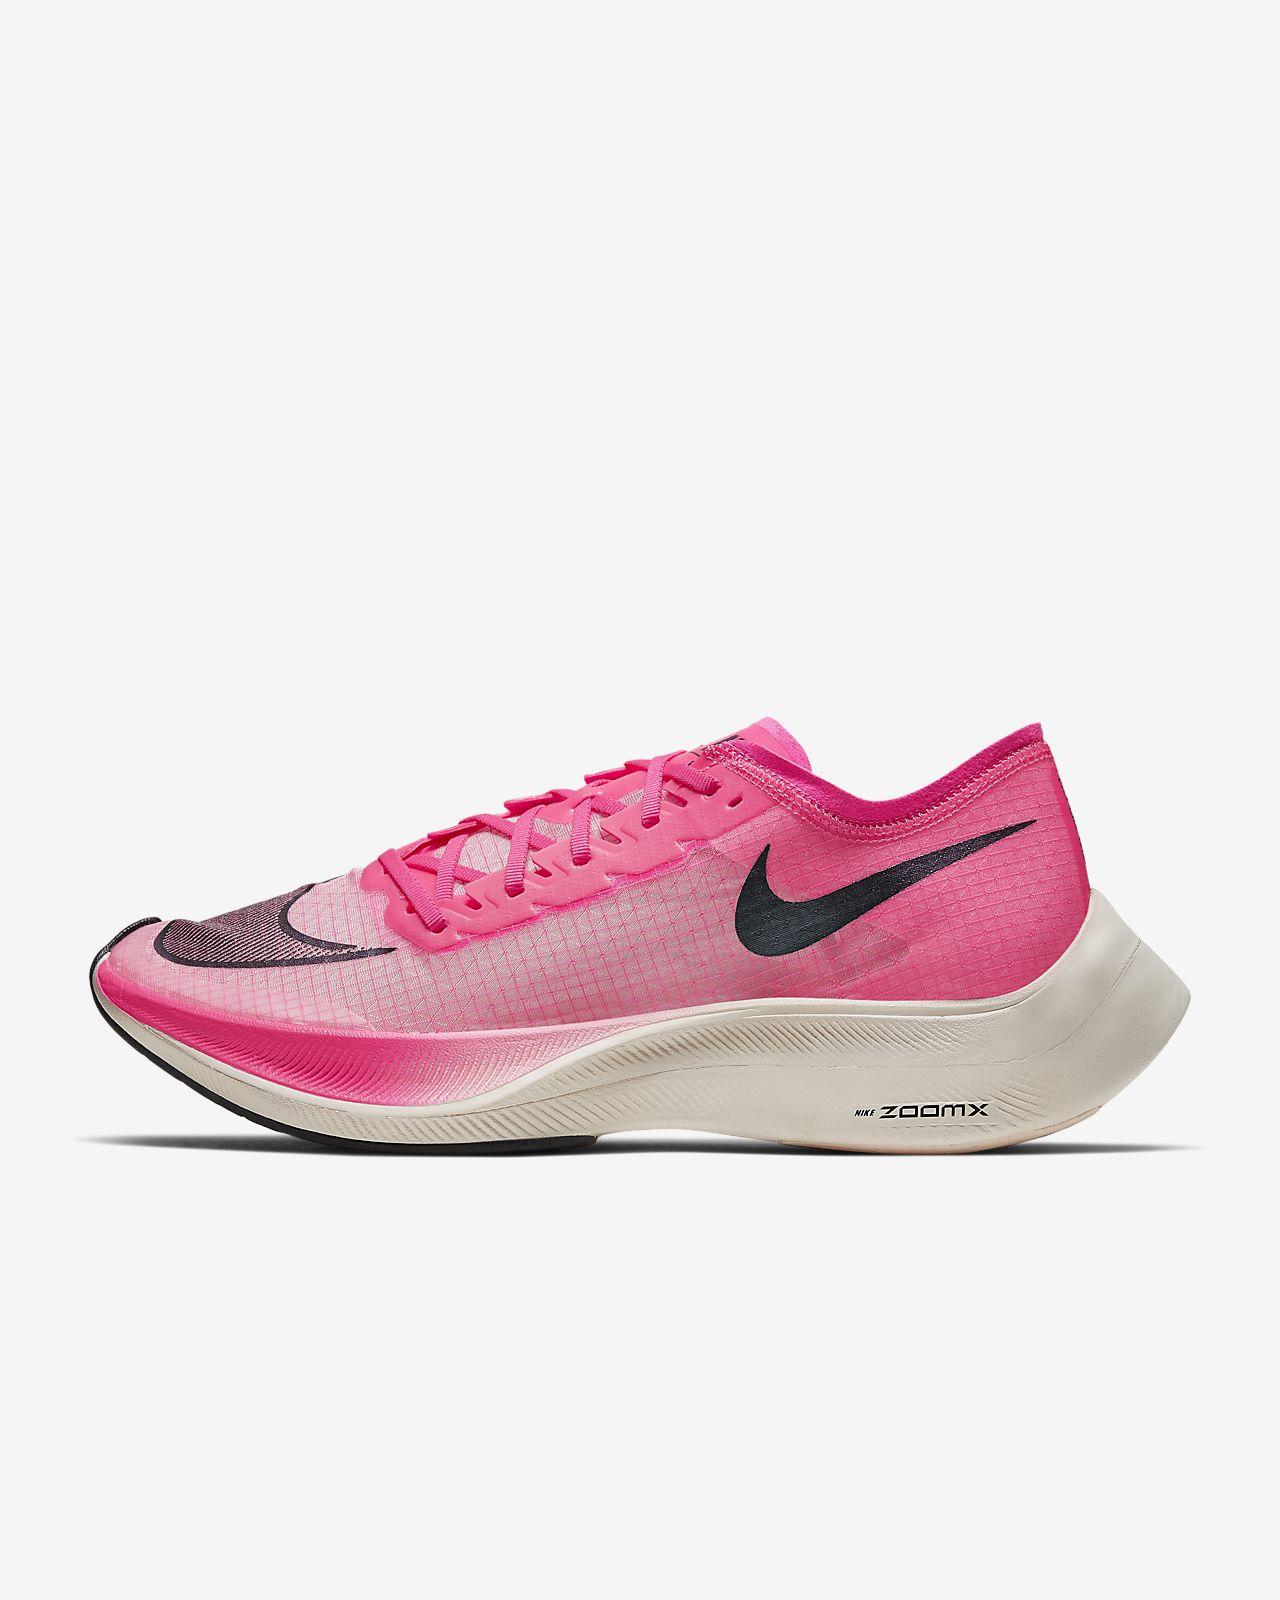 Nike ZoomX Vaporfly NEXT% Sabatilles de running